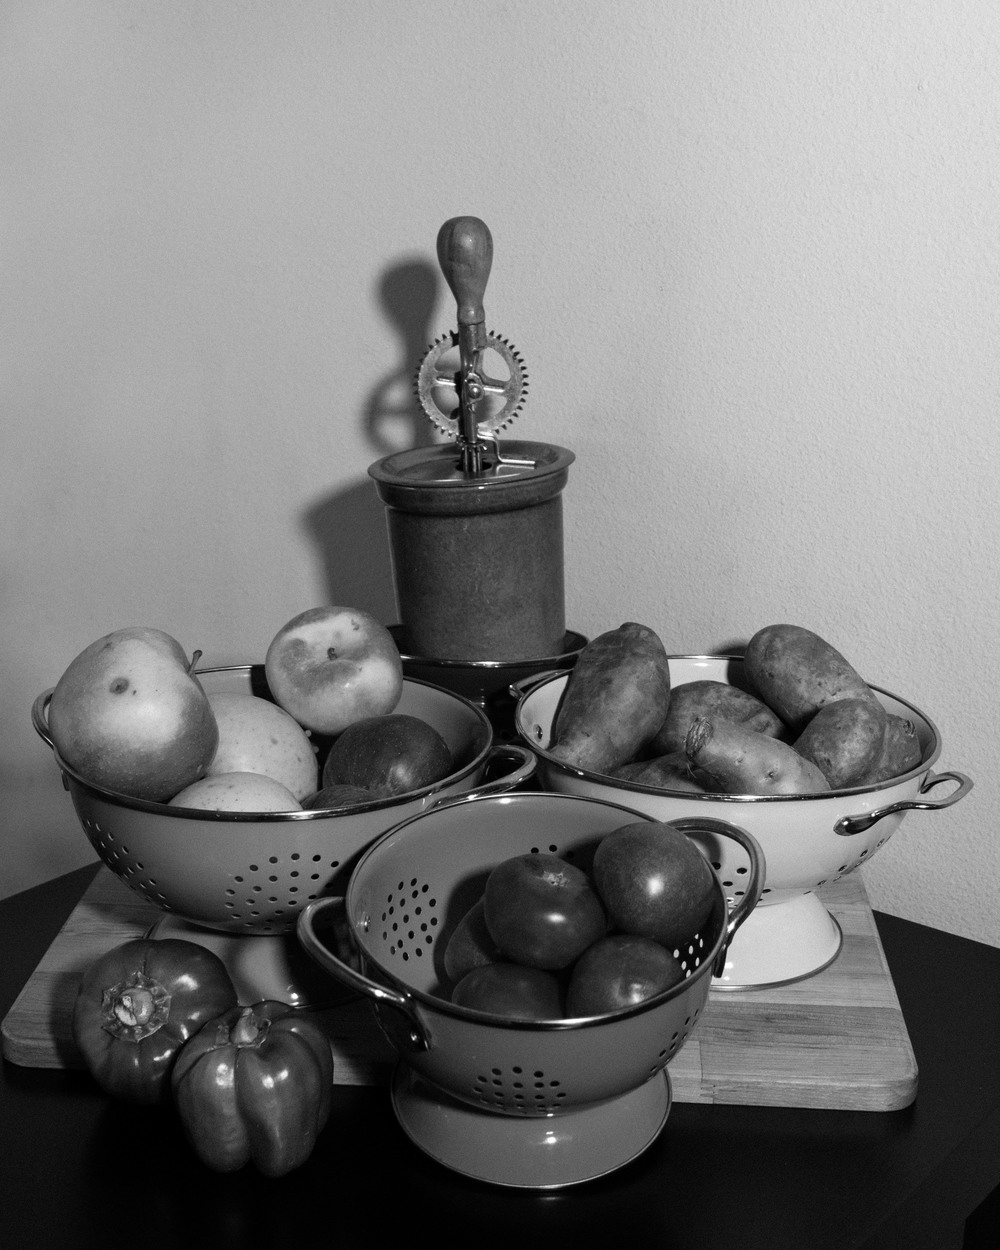 Scott_Ramsey-Kitchen_Still_Life_1.jpg